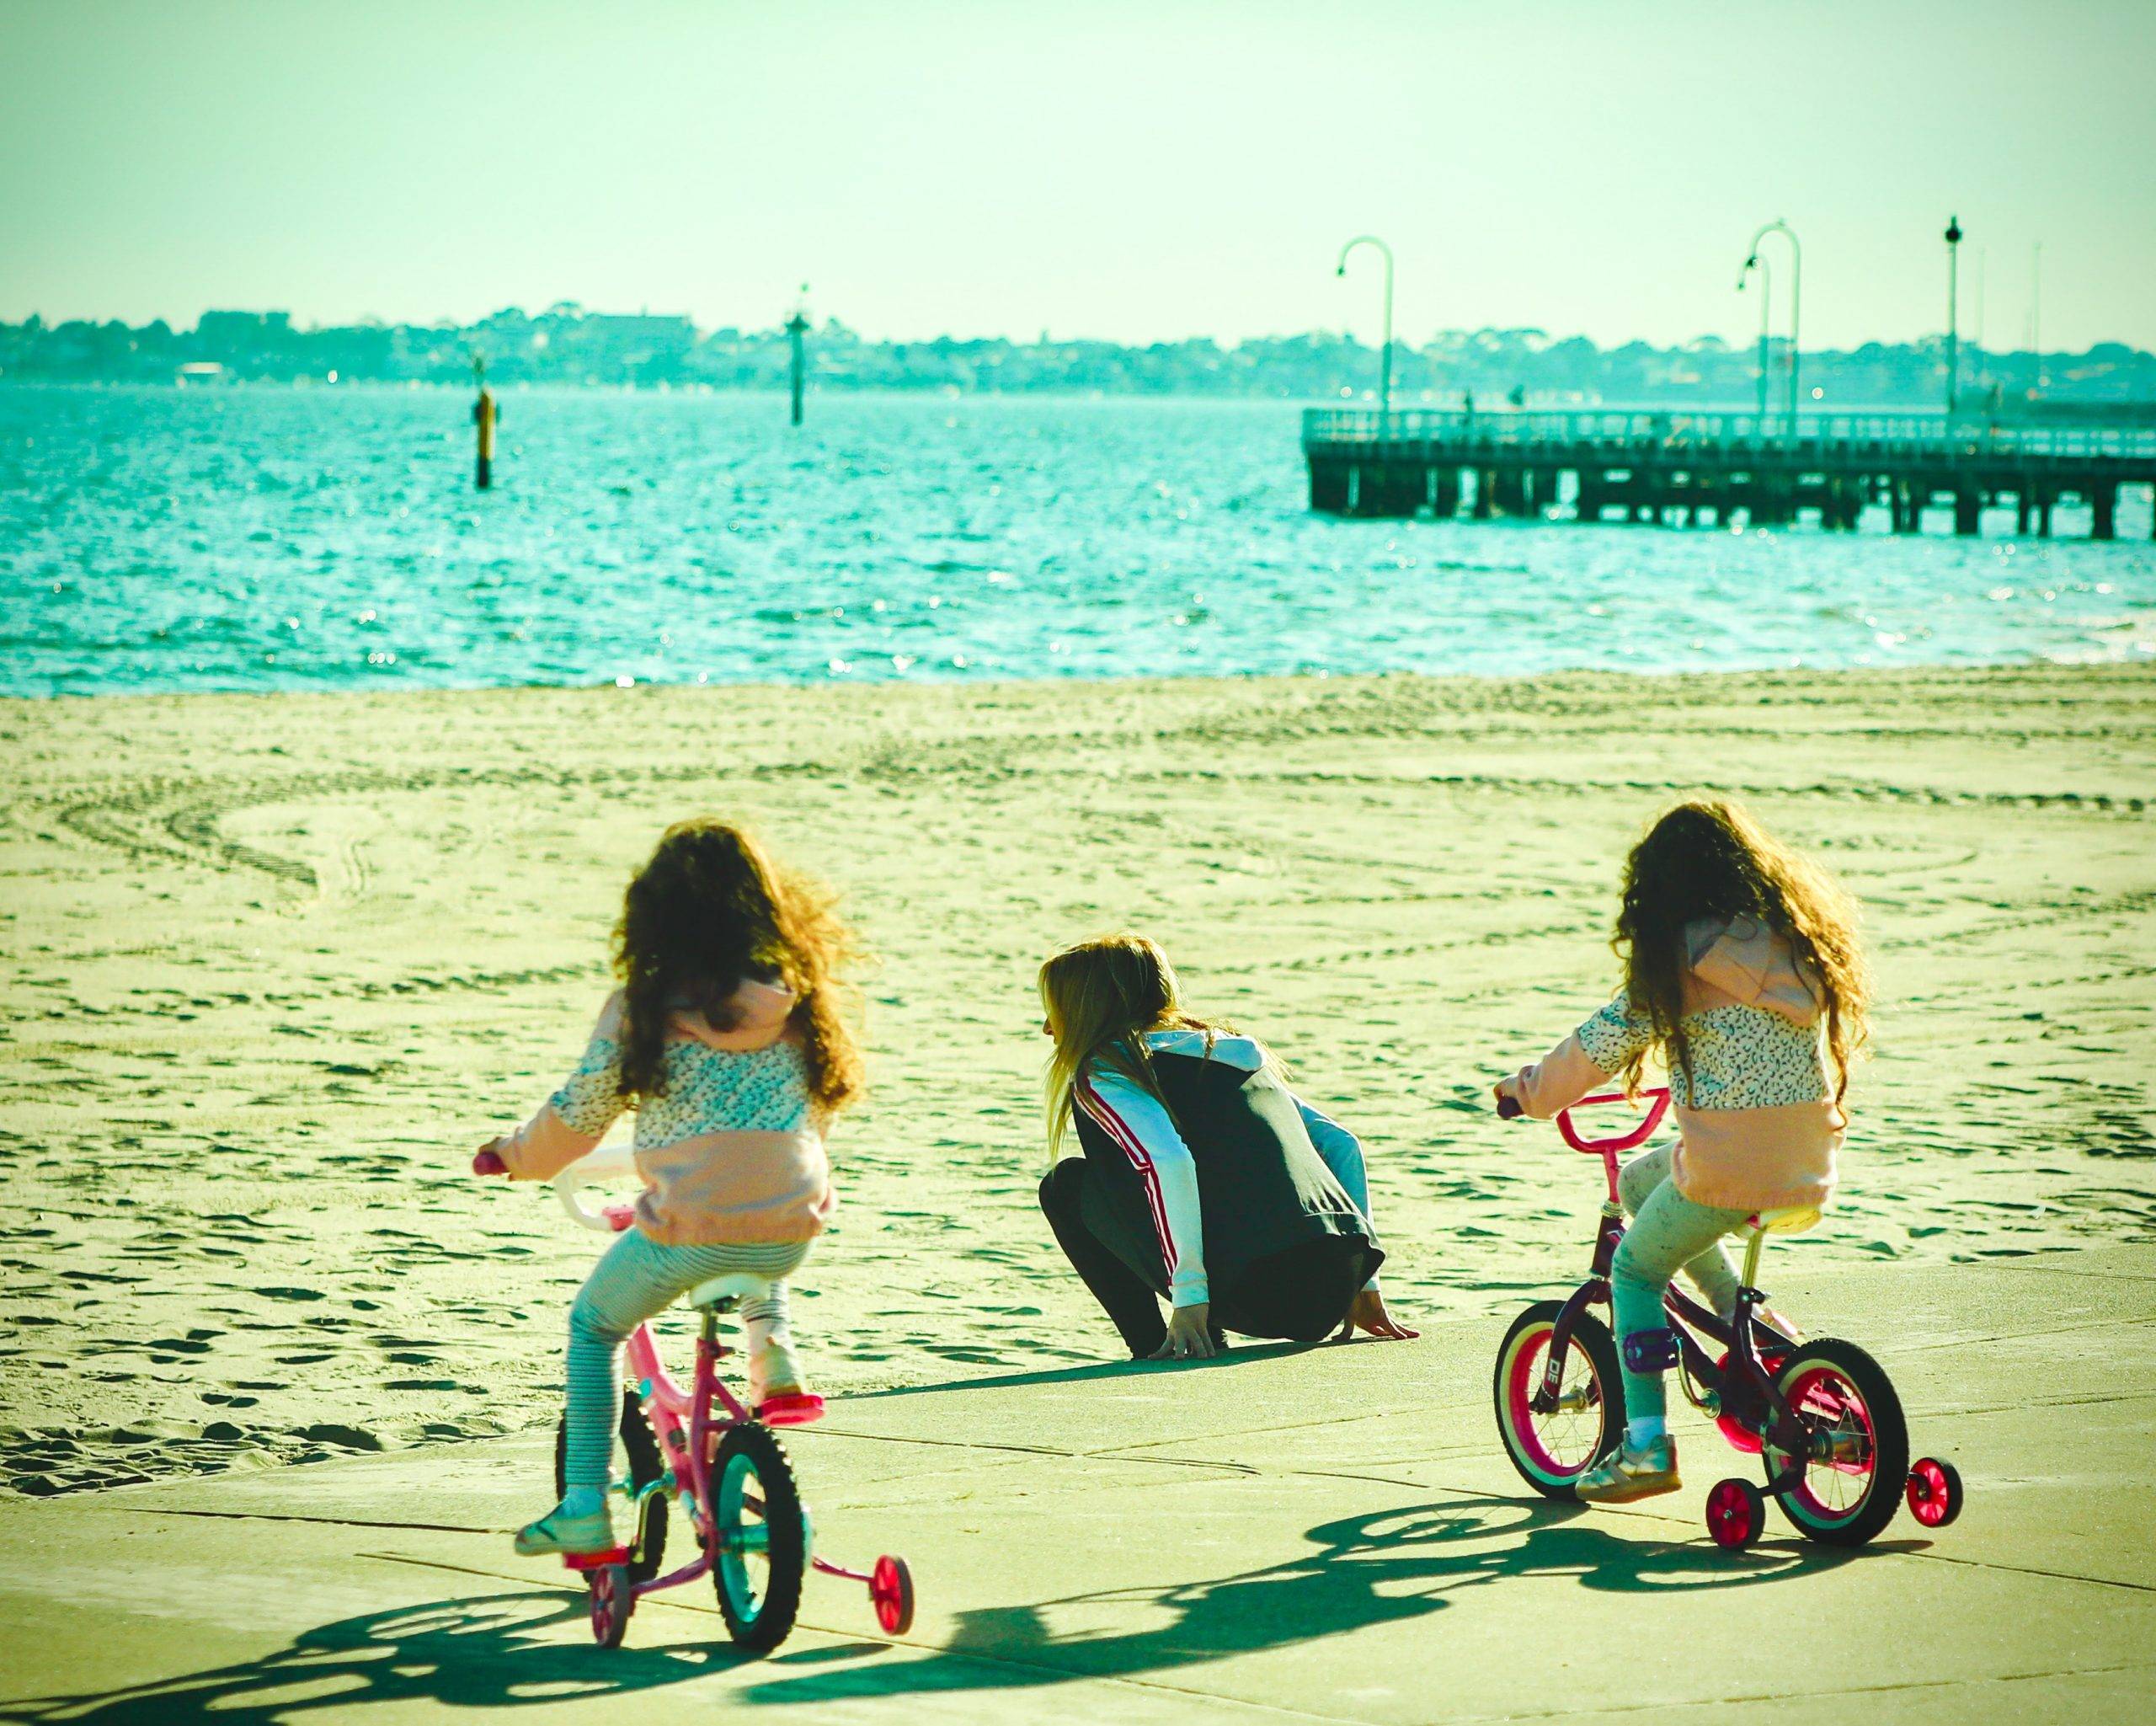 Niñas montando bicicletas con ruedas de entrenamiento.